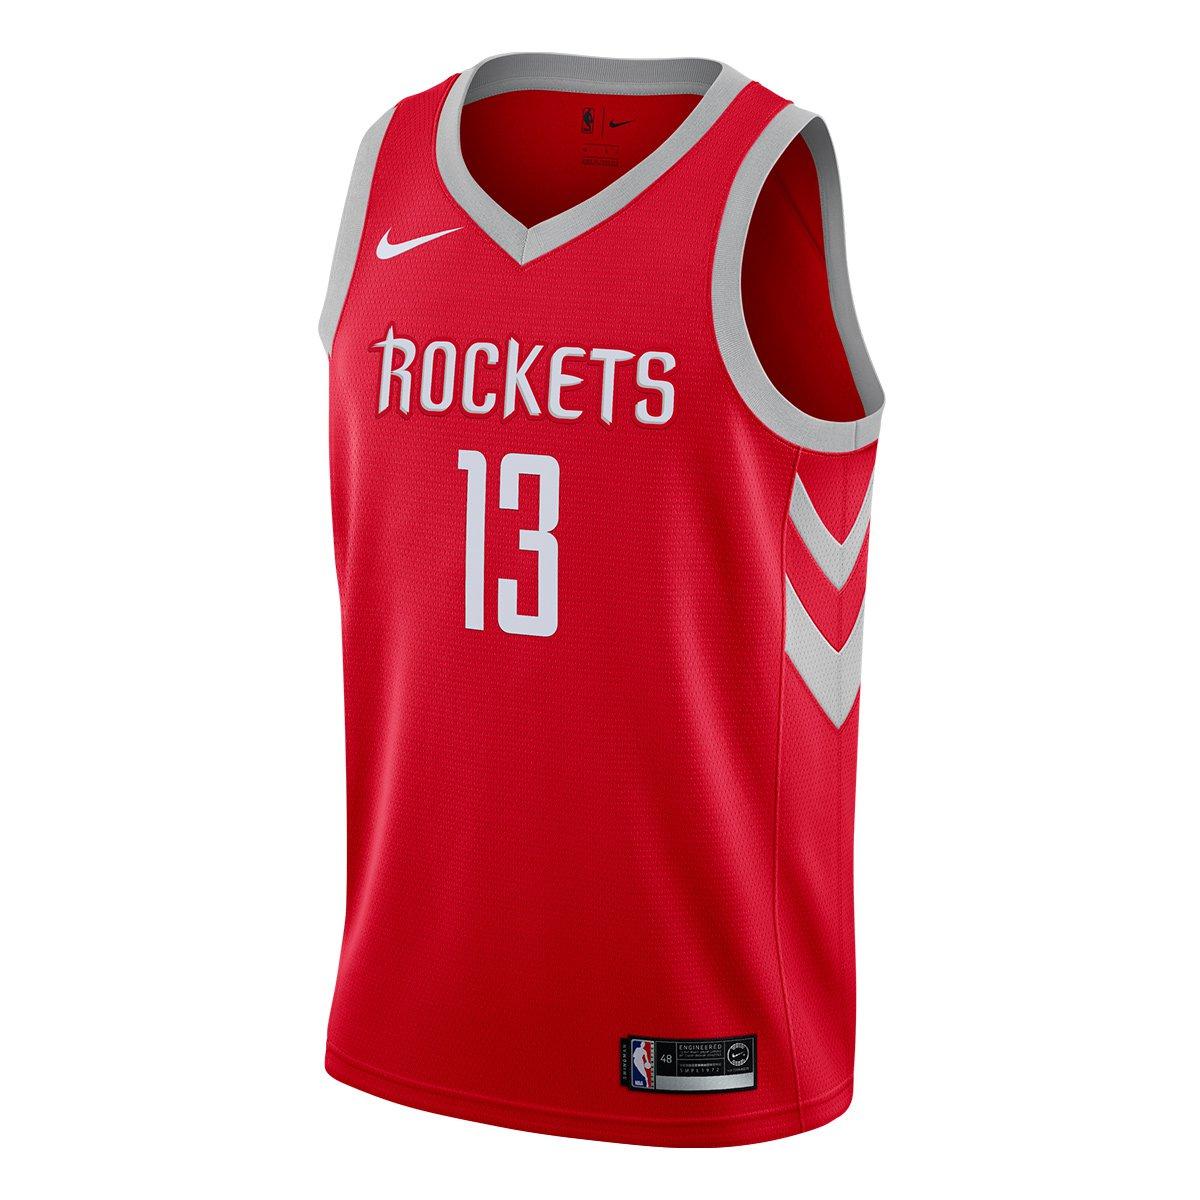 Regata Swingman NBA Houston Rockets James Harden Nike Road - Compre Agora  7e0d256f7